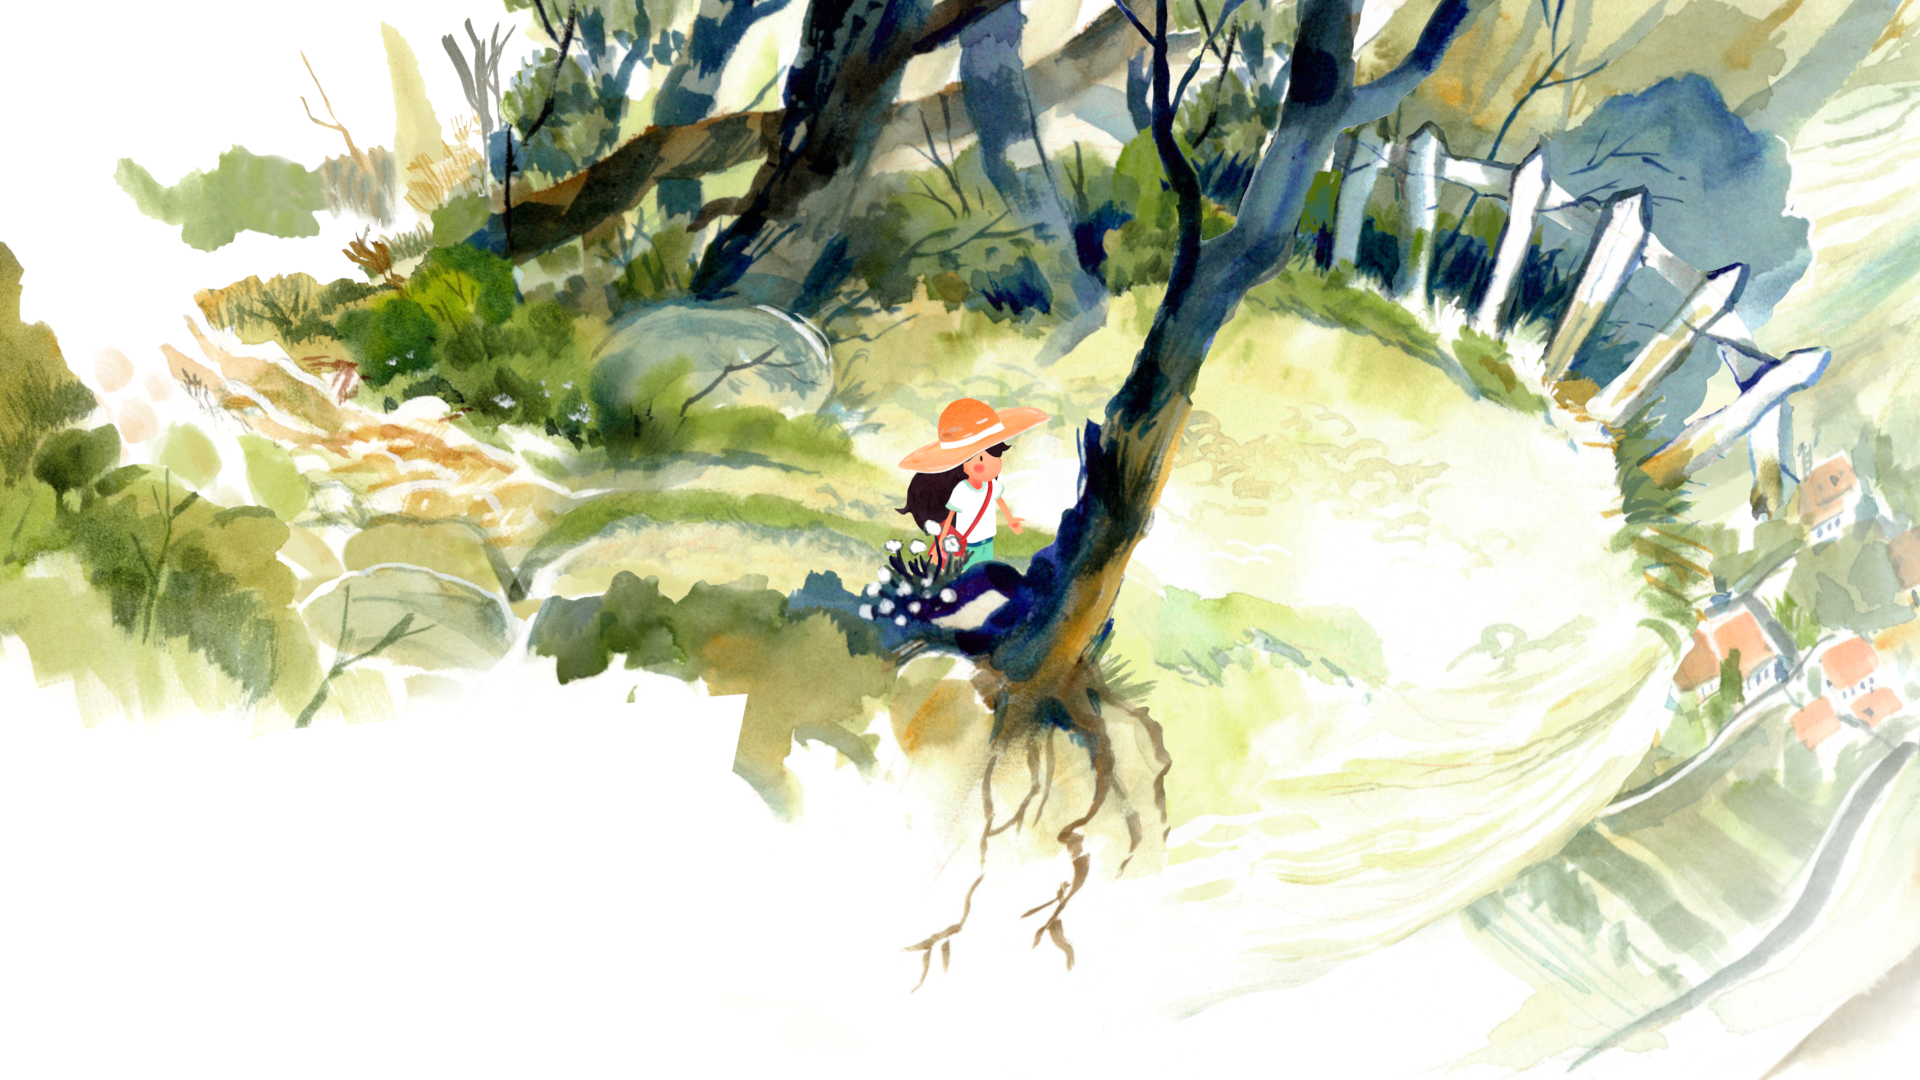 Dordogne Looks Like The Watercoloured Hug We All Need